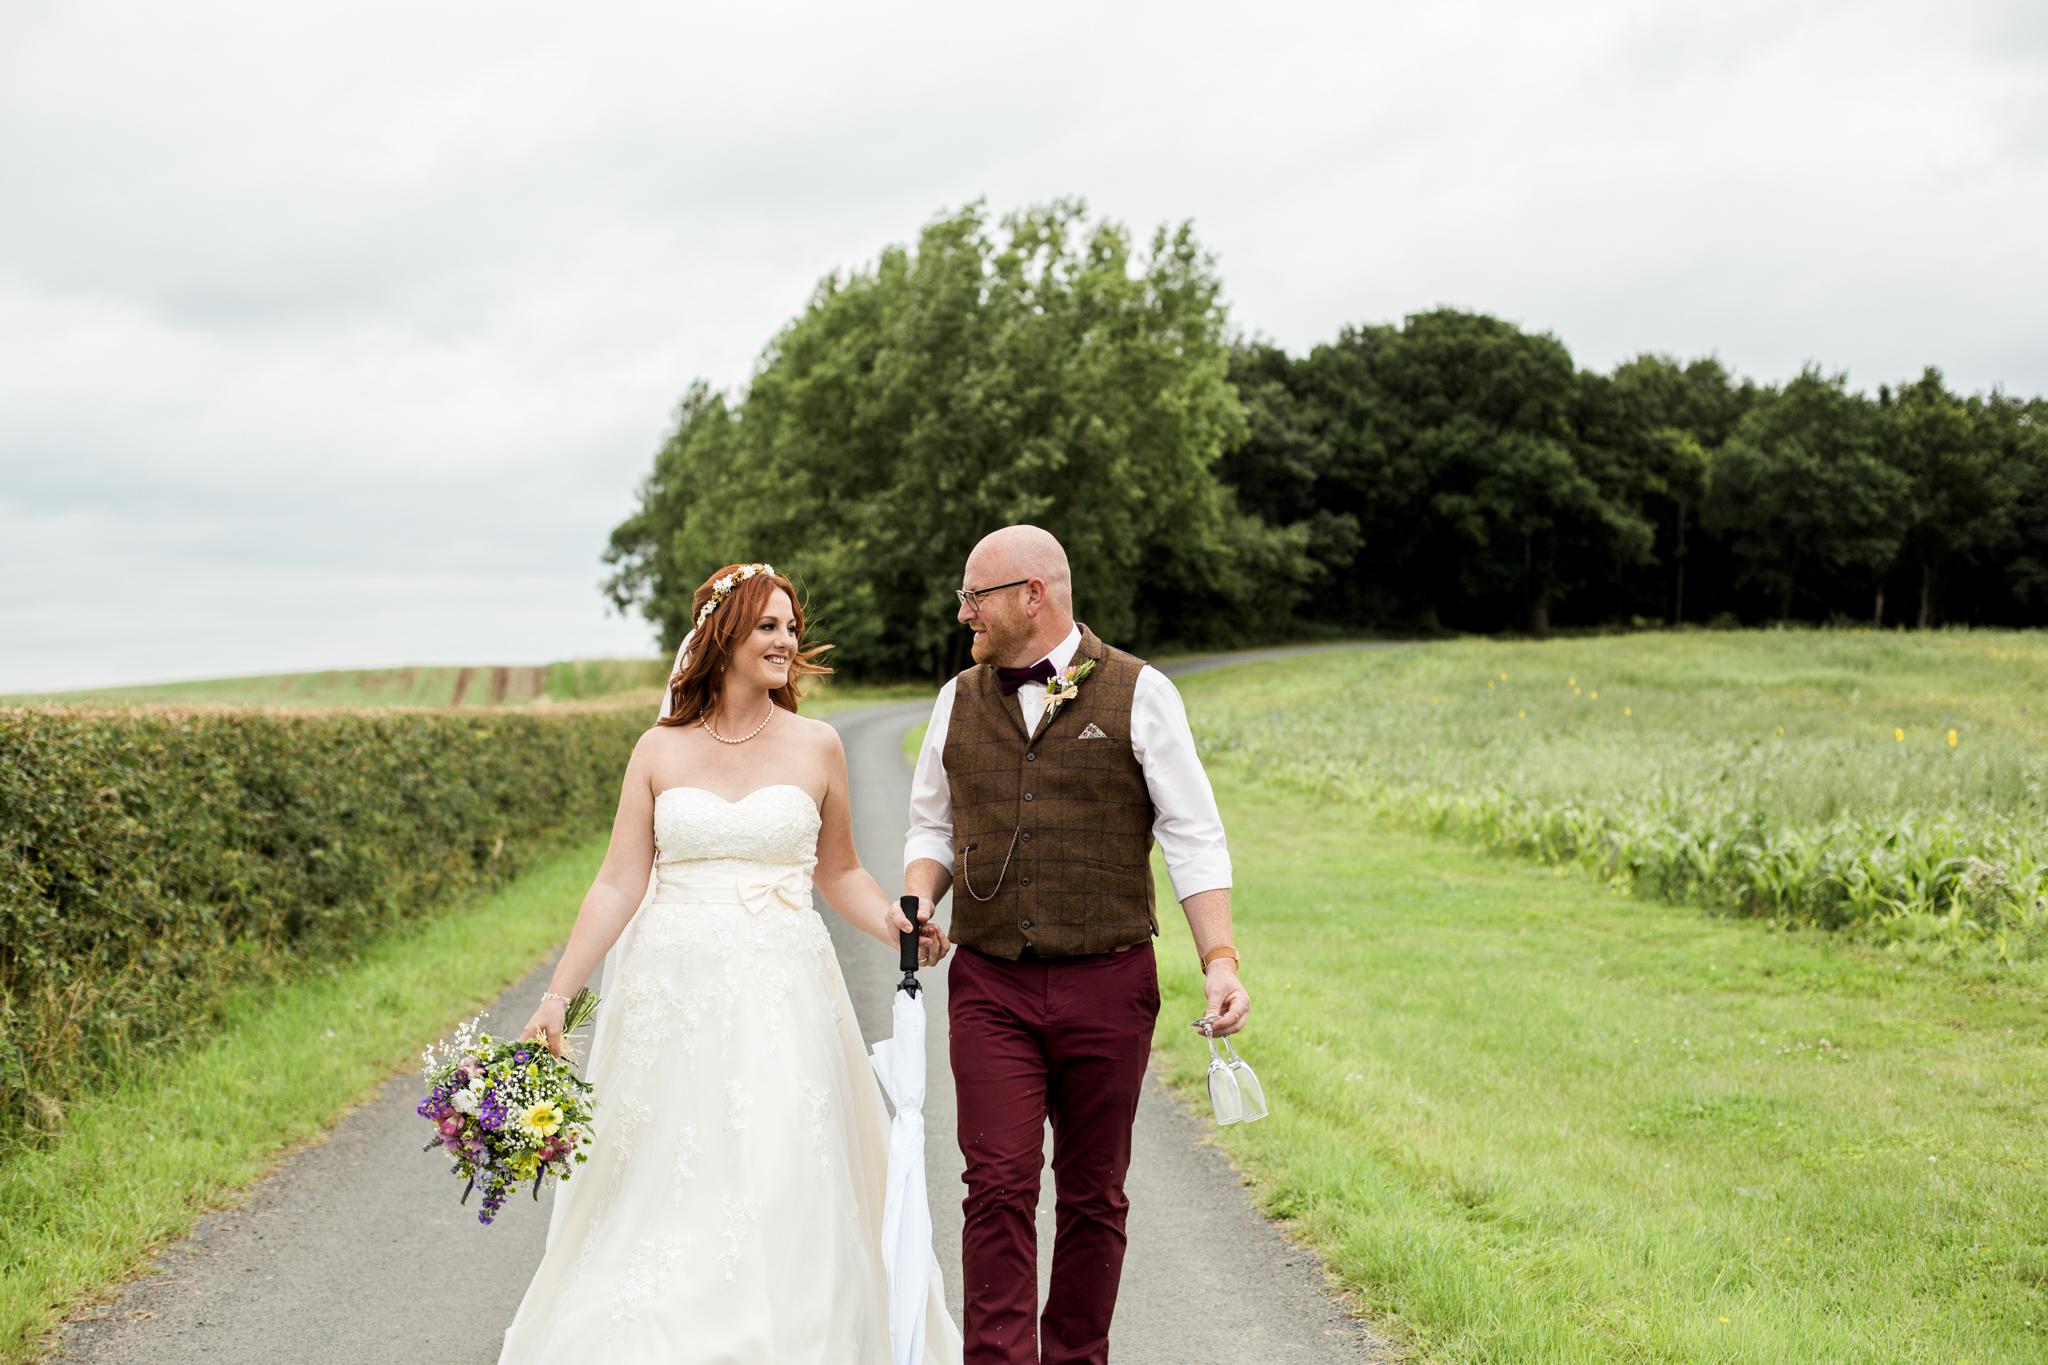 Rowsie & Lee, Swallows Nest Barn Wedding, Cotswold wedding photographer, Warwickshire Wedding Photographer-94.jpg